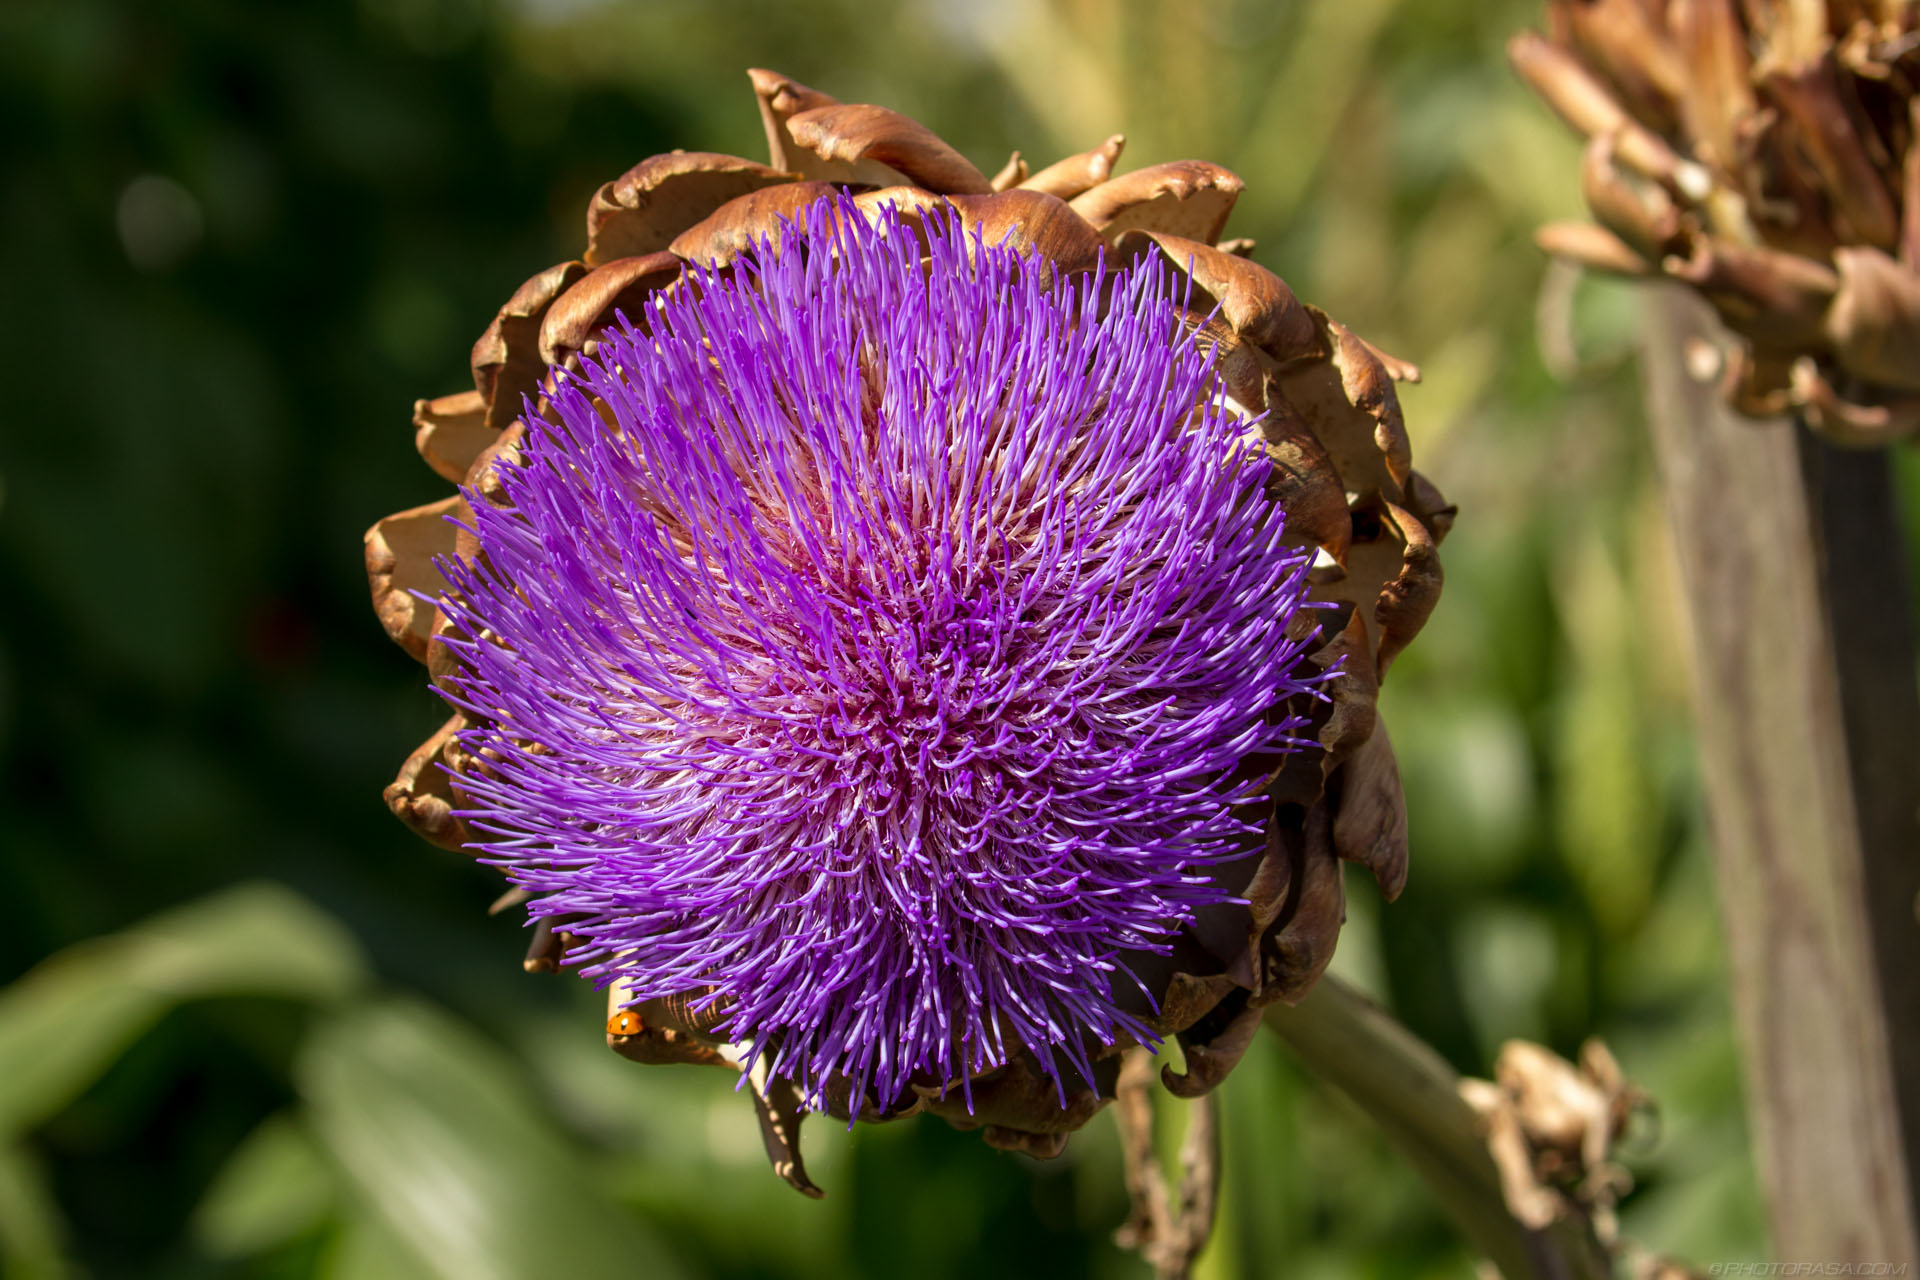 http://photorasa.com/nature/strange-exotic-flowers/attachment/purple-head-of-artichoke-flower/